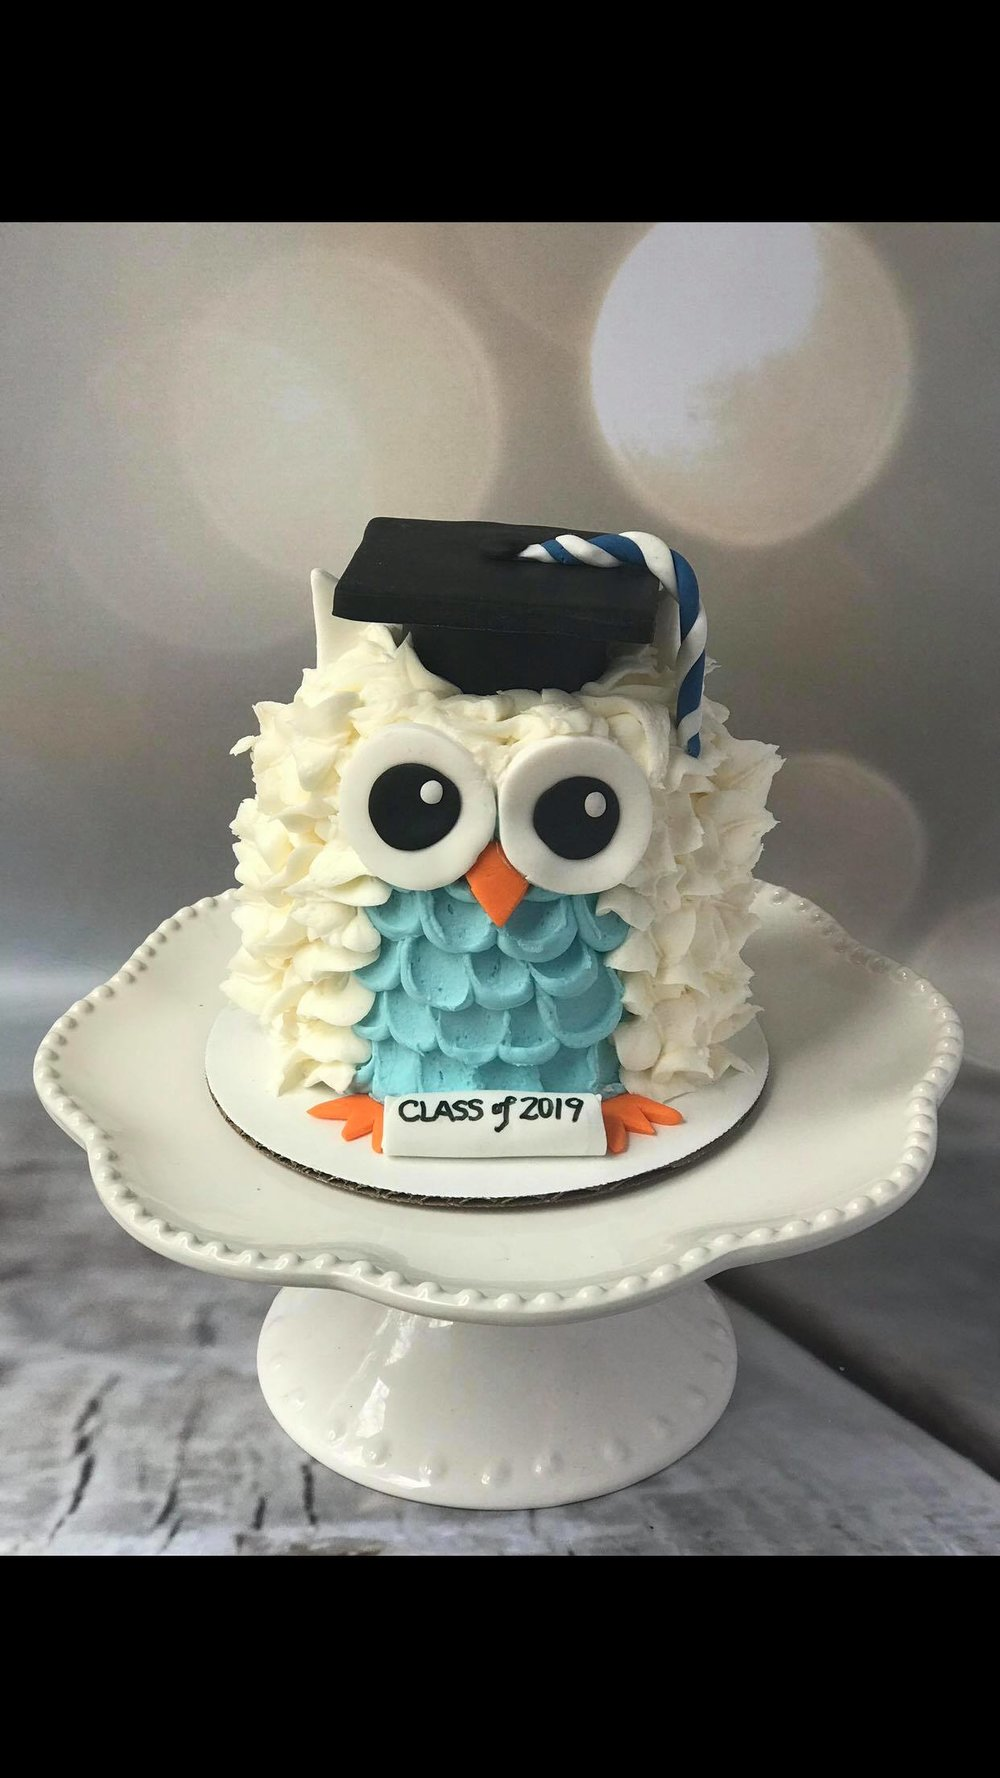 Owl Graduate Mini Cake - $30This adorable mini cake feeds 4-5 people and is a fun little celebration cake for any graduate!!!Available in chocolate, vanilla, funfetti or lemon